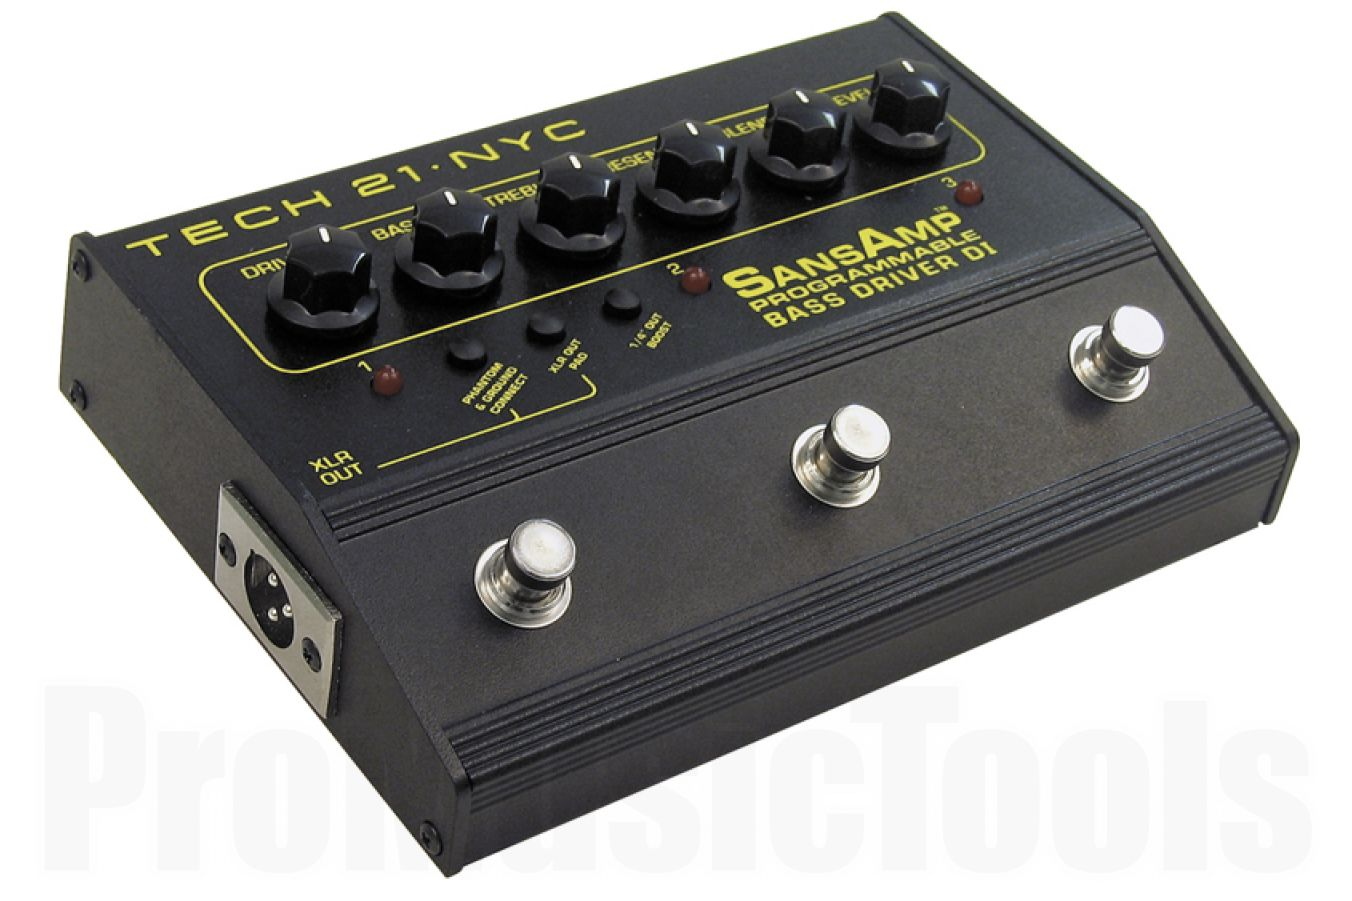 Tech 21 USA SansAmp Bass Driver D.I. Programmable - b-stock (1x opened box)